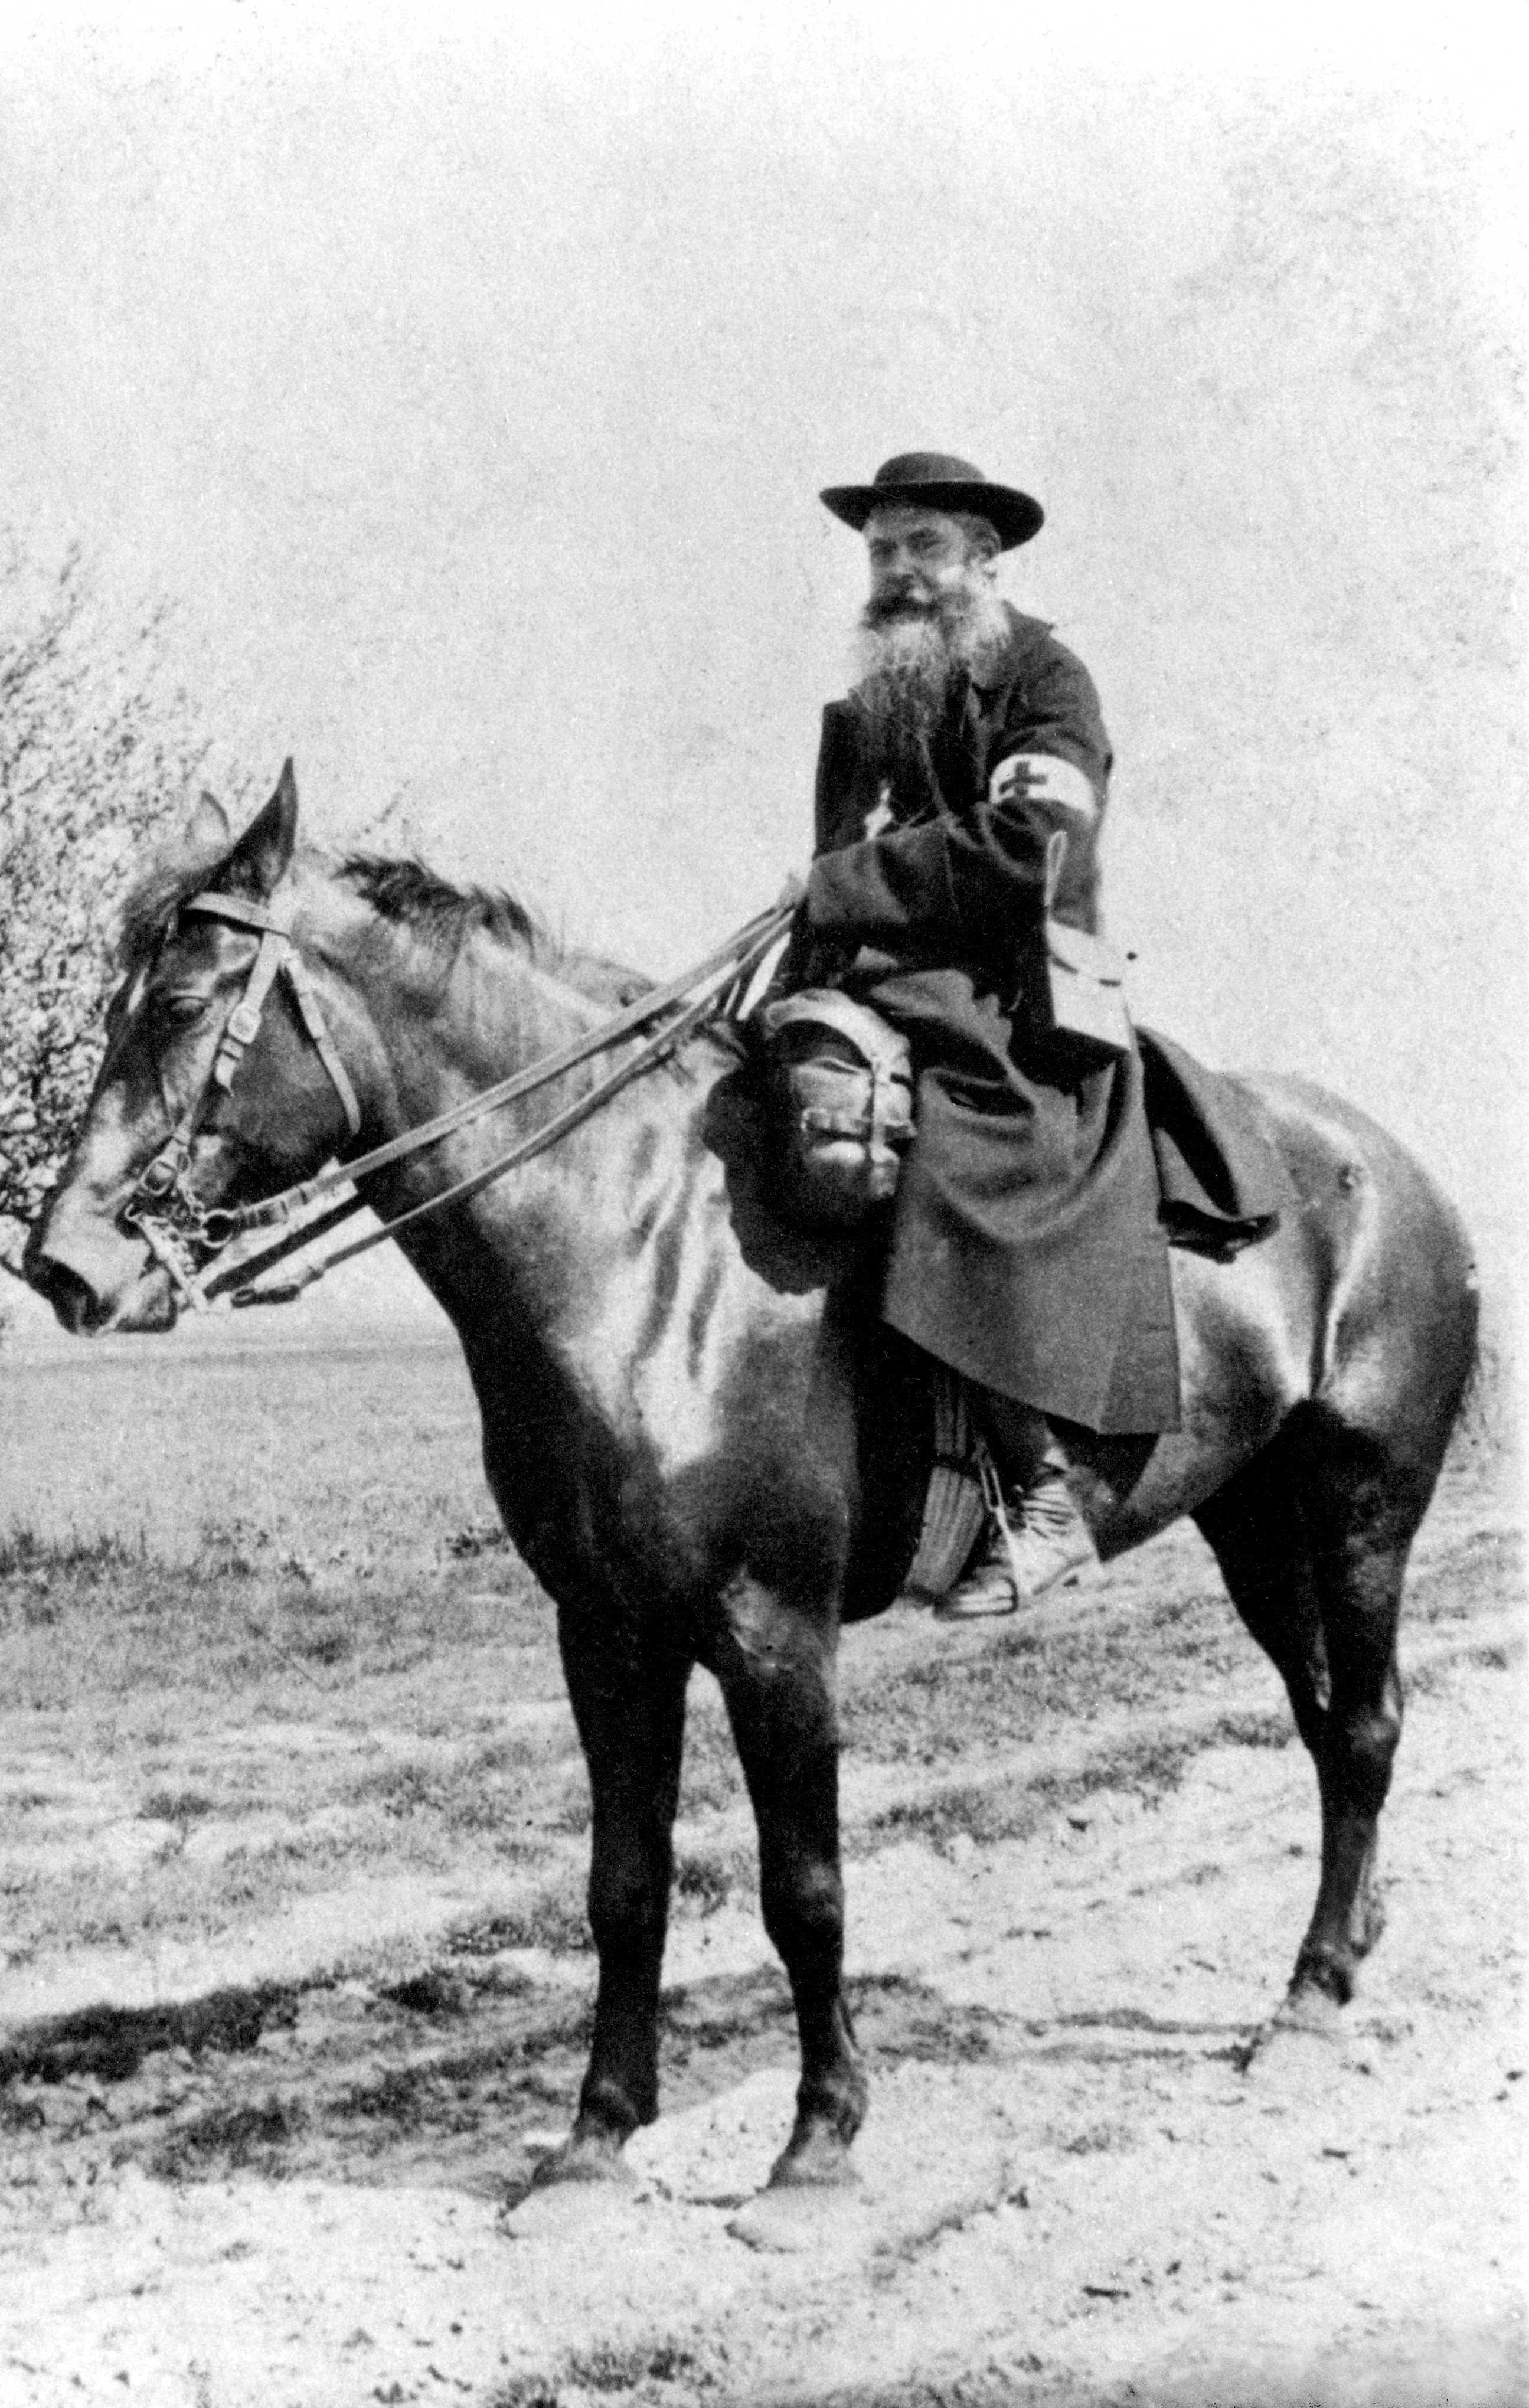 P. Daniel Brottier als Militärkaplan im Ersten Weltkrieg